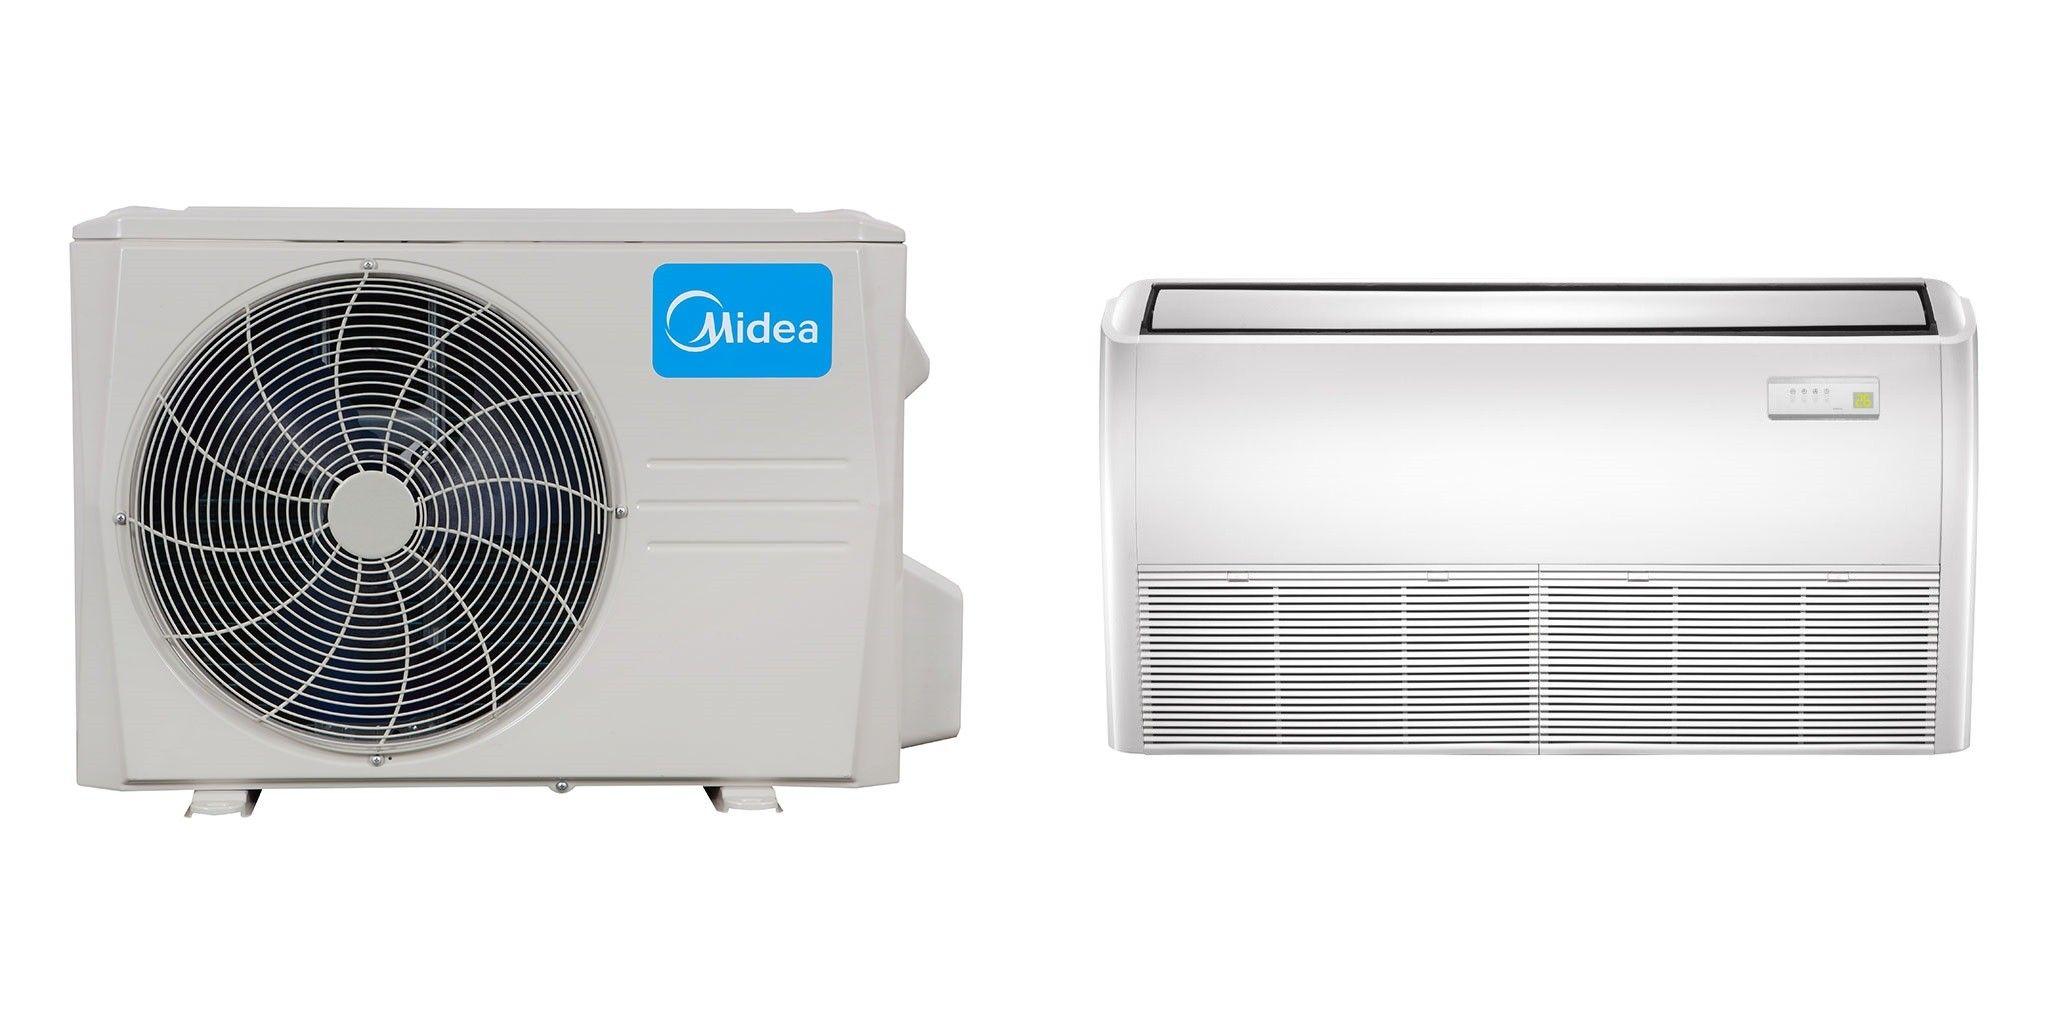 Split AC System in Minisplitwarehouse. Buy products